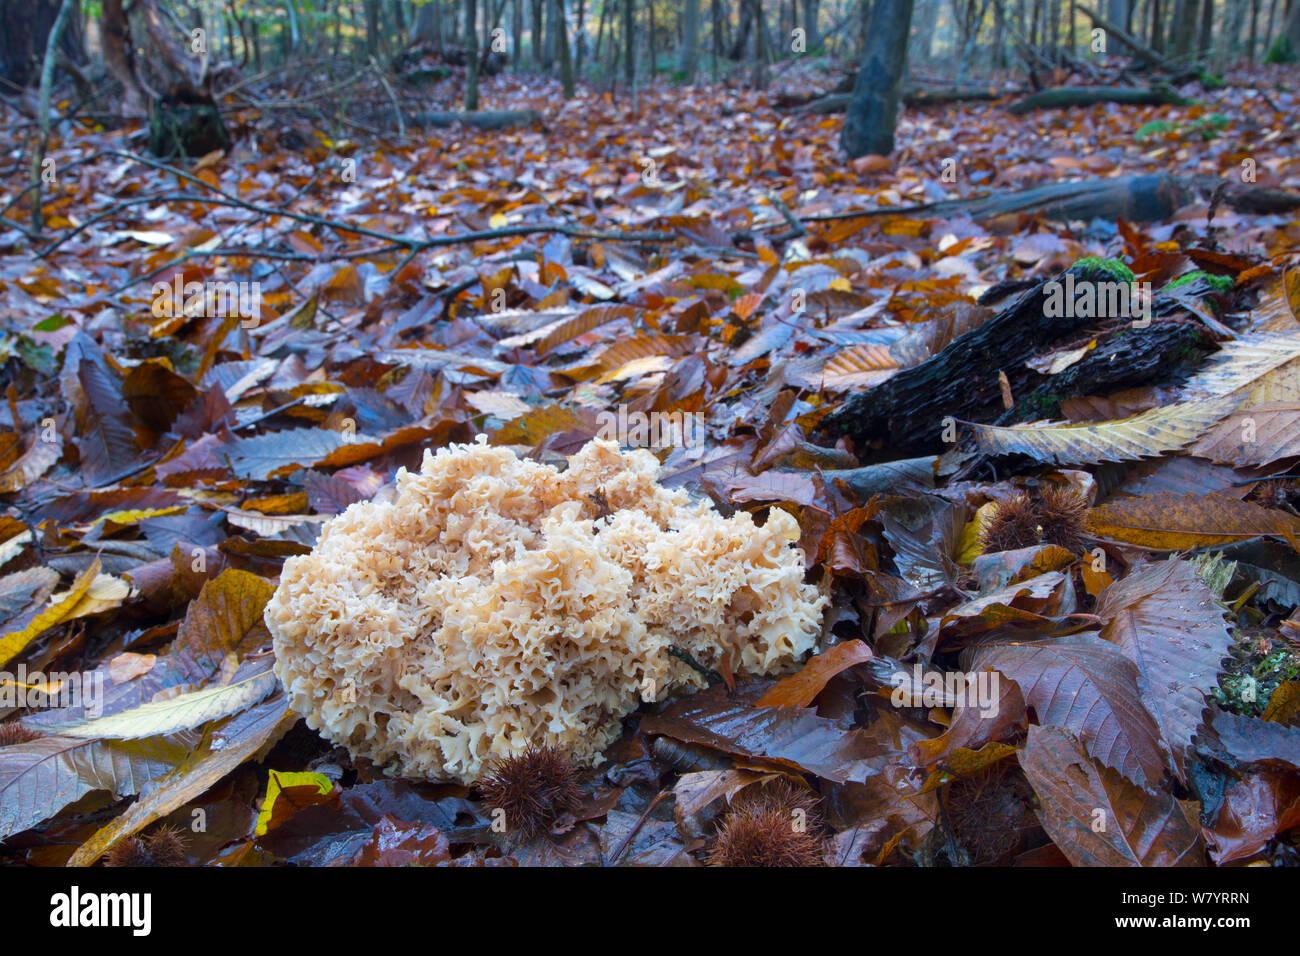 Cauliflower fungus (Sparassis crispa) growing parasitically on the roots of conifer. Norfolk, England, UK. November. Stock Photo